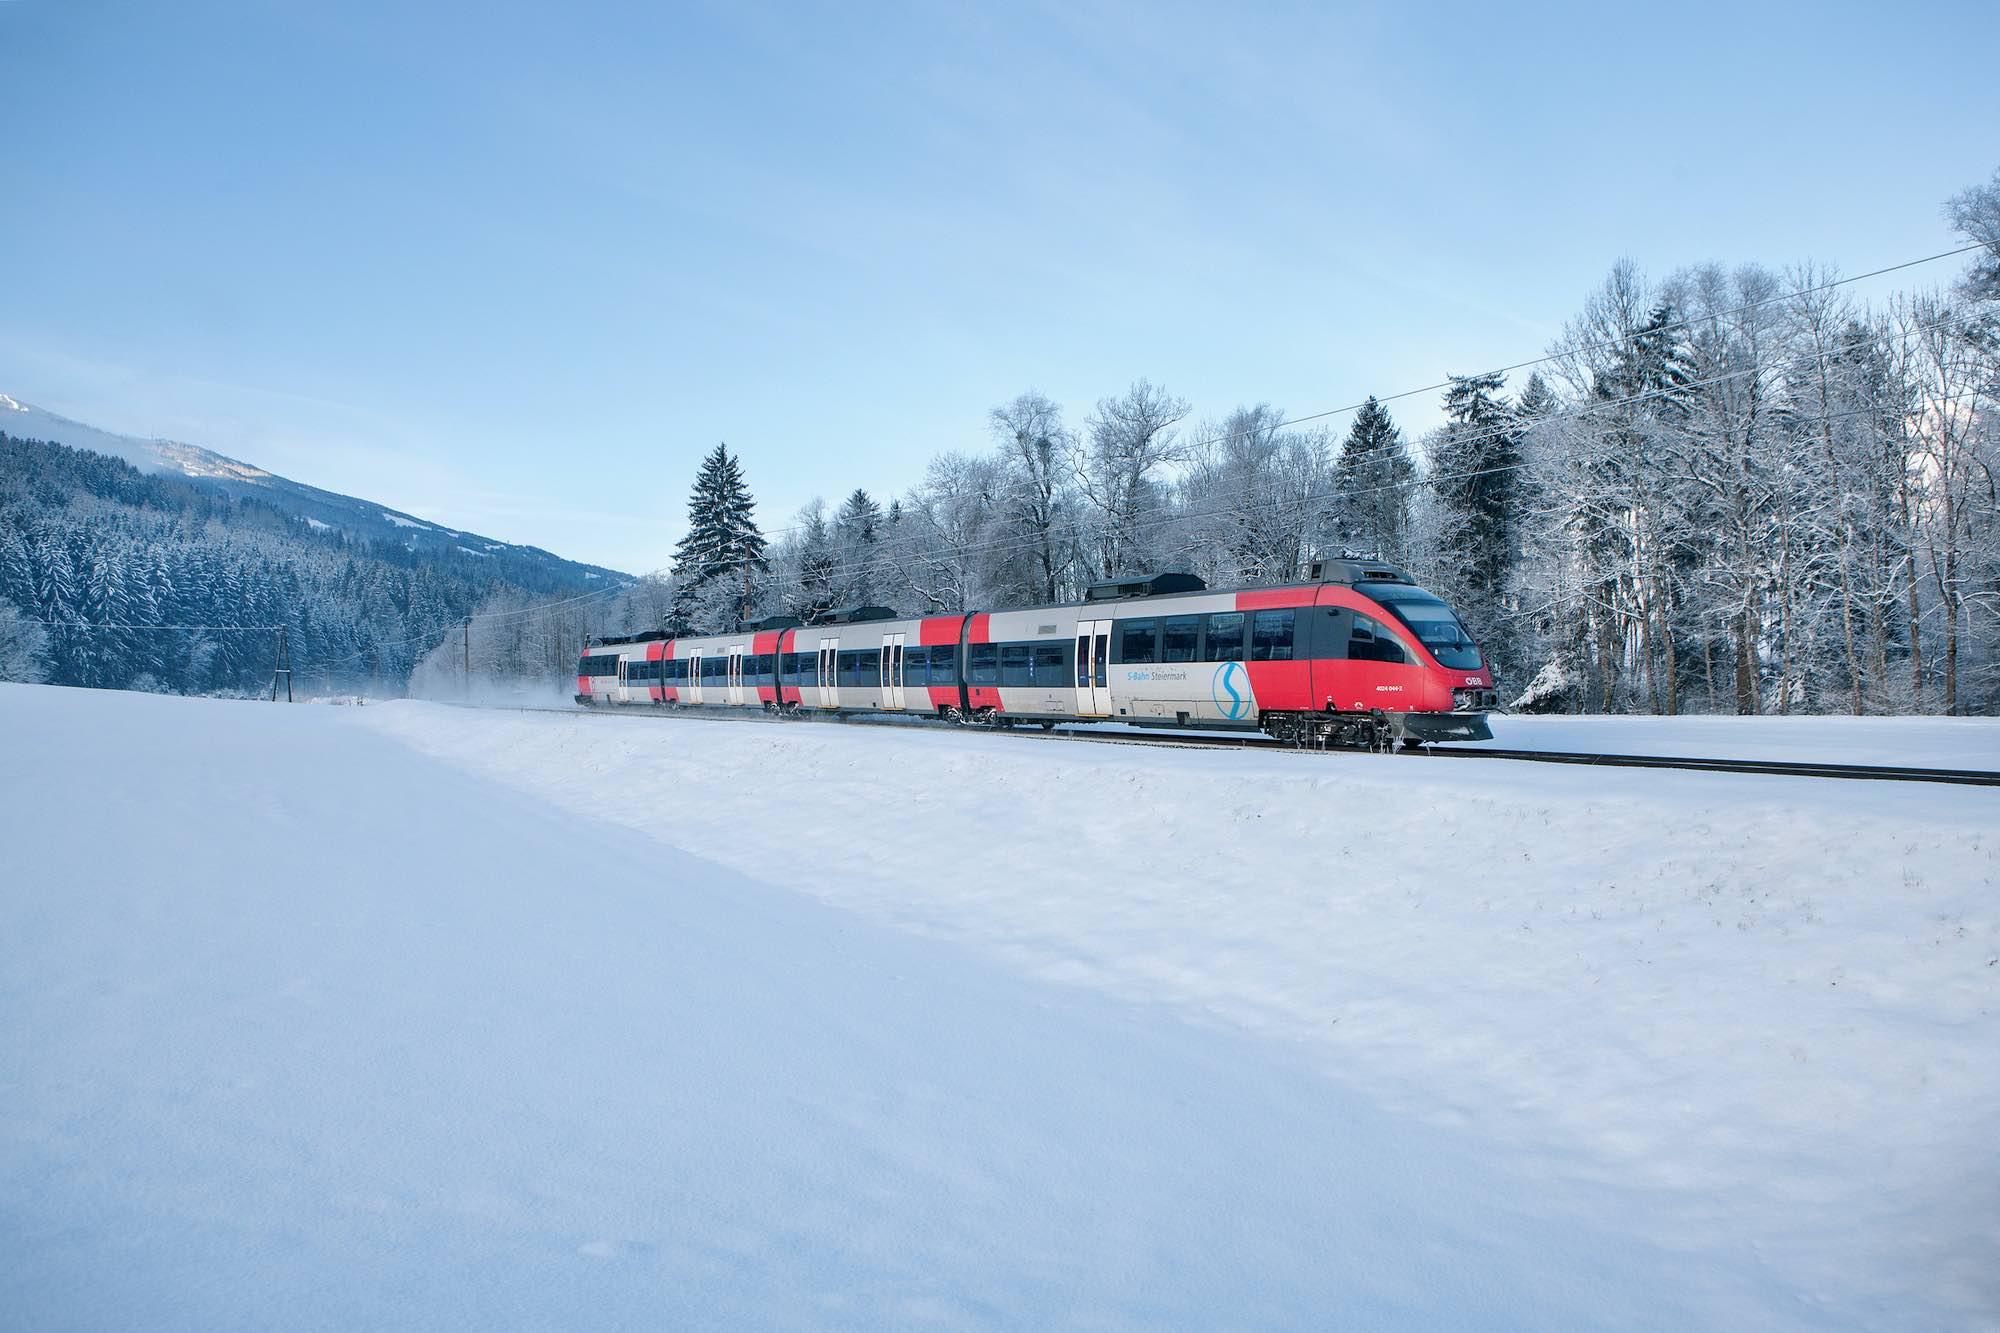 Ski train travel from UK to Austria